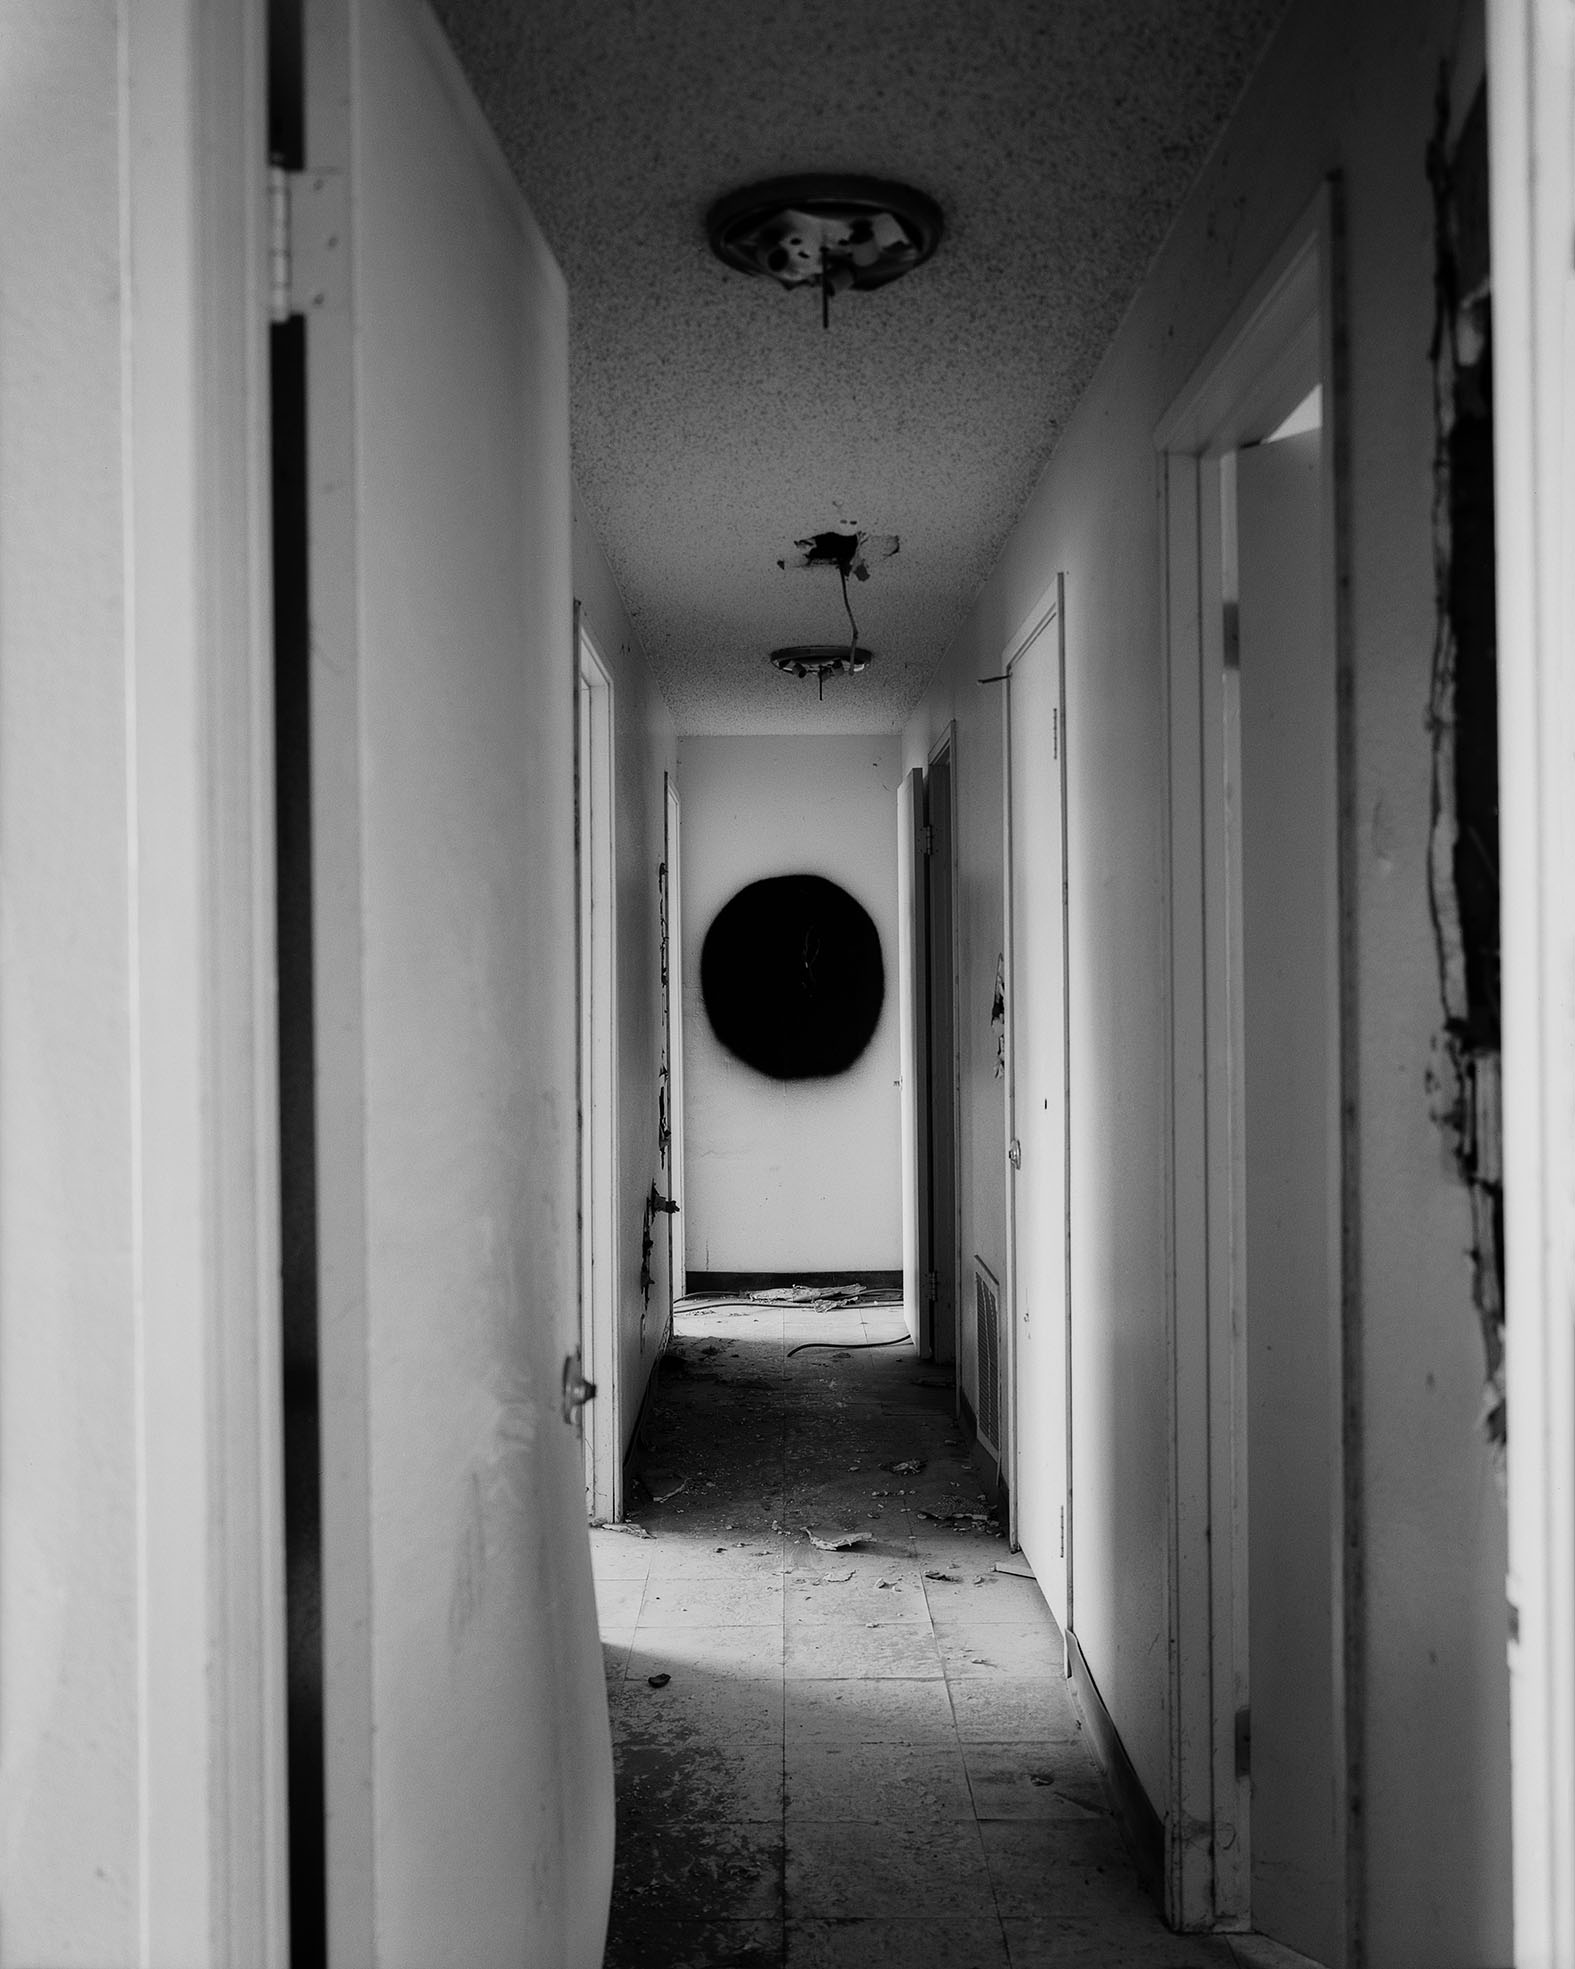 John Divola: Terminus